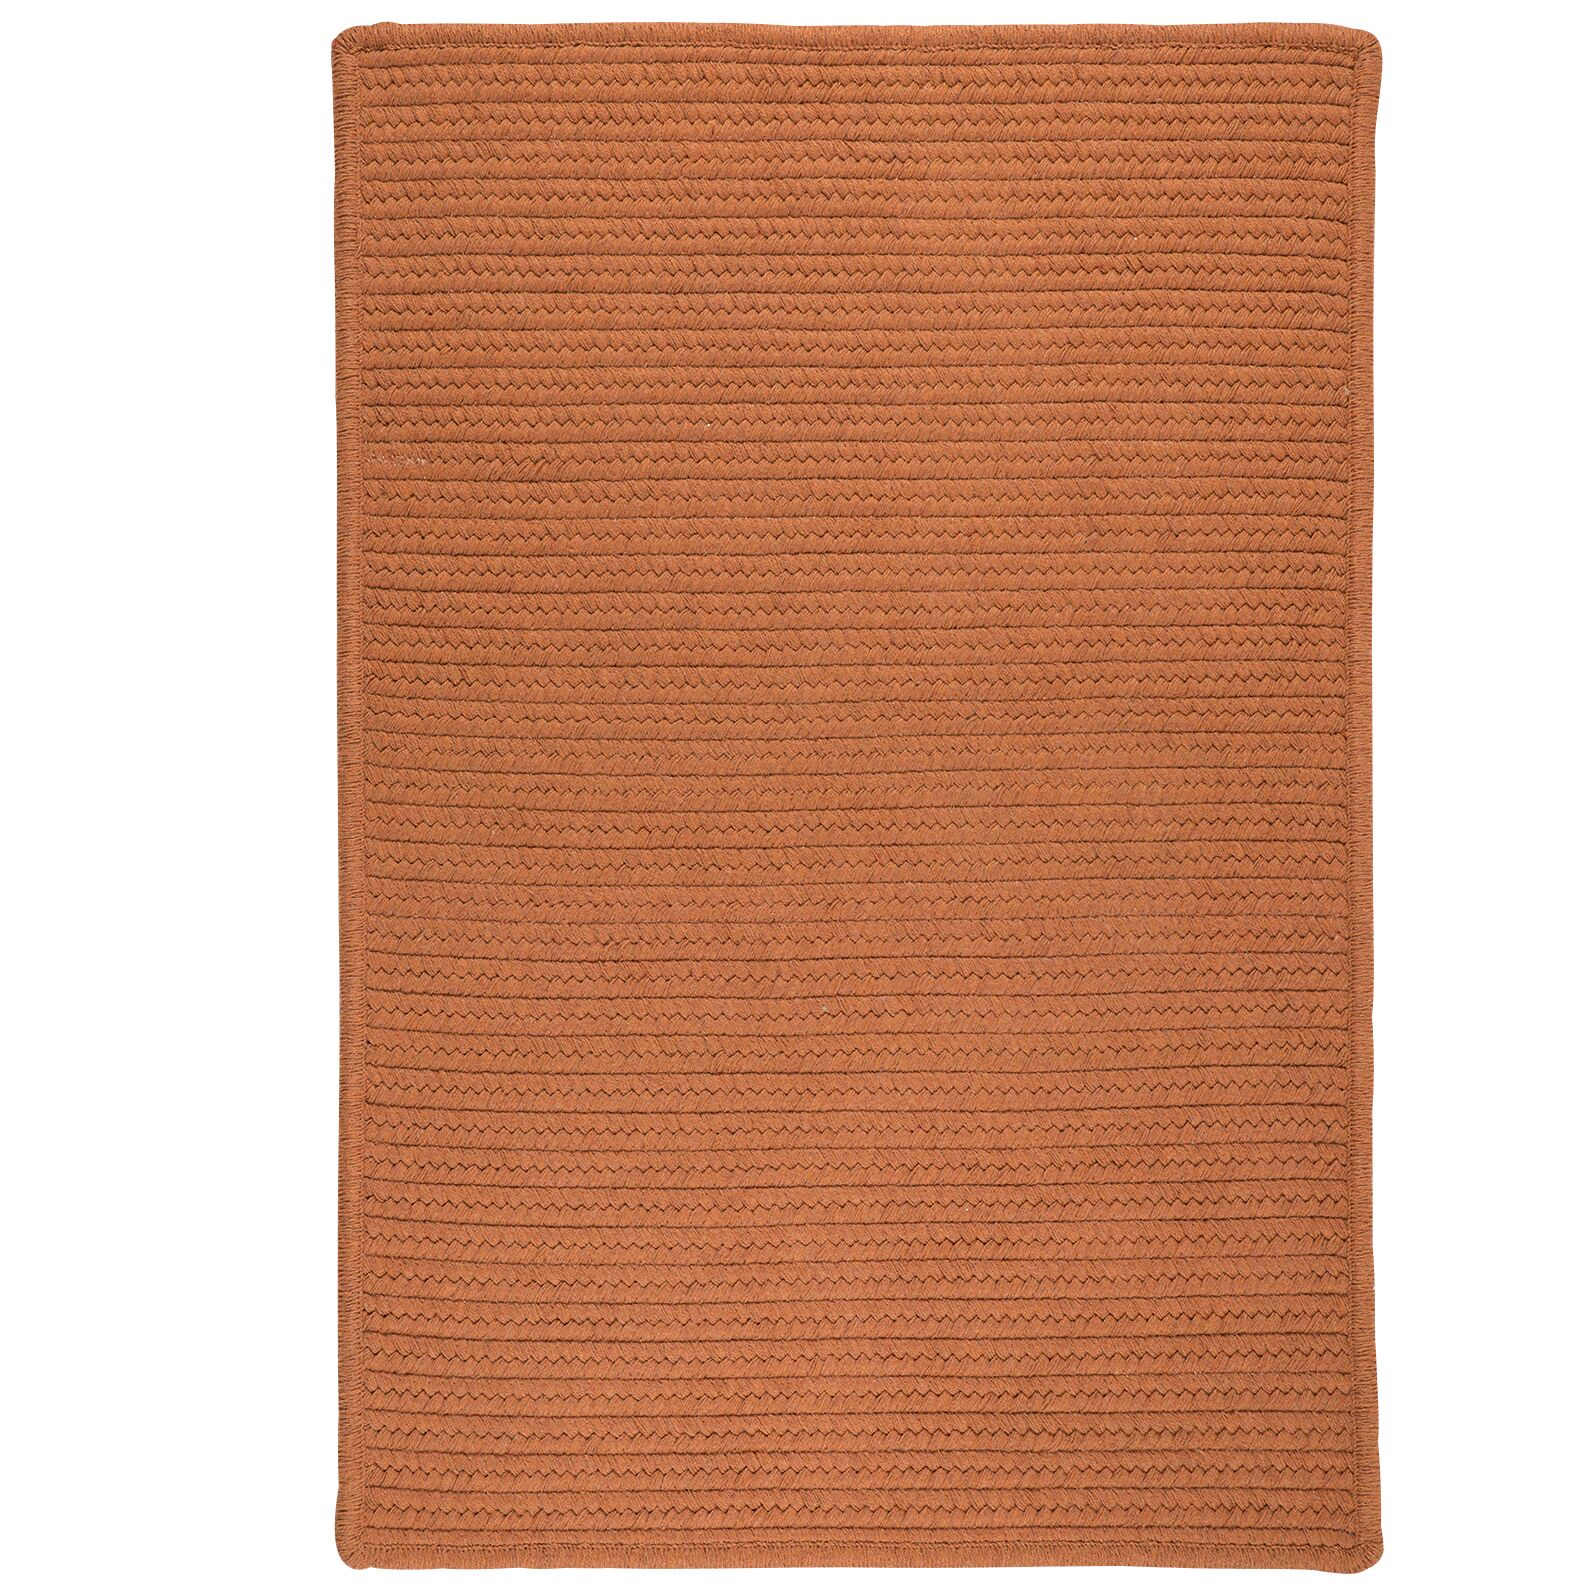 Irini Hand-Woven Orange Area Rug Rug Size: Rectangle 12' x 15'